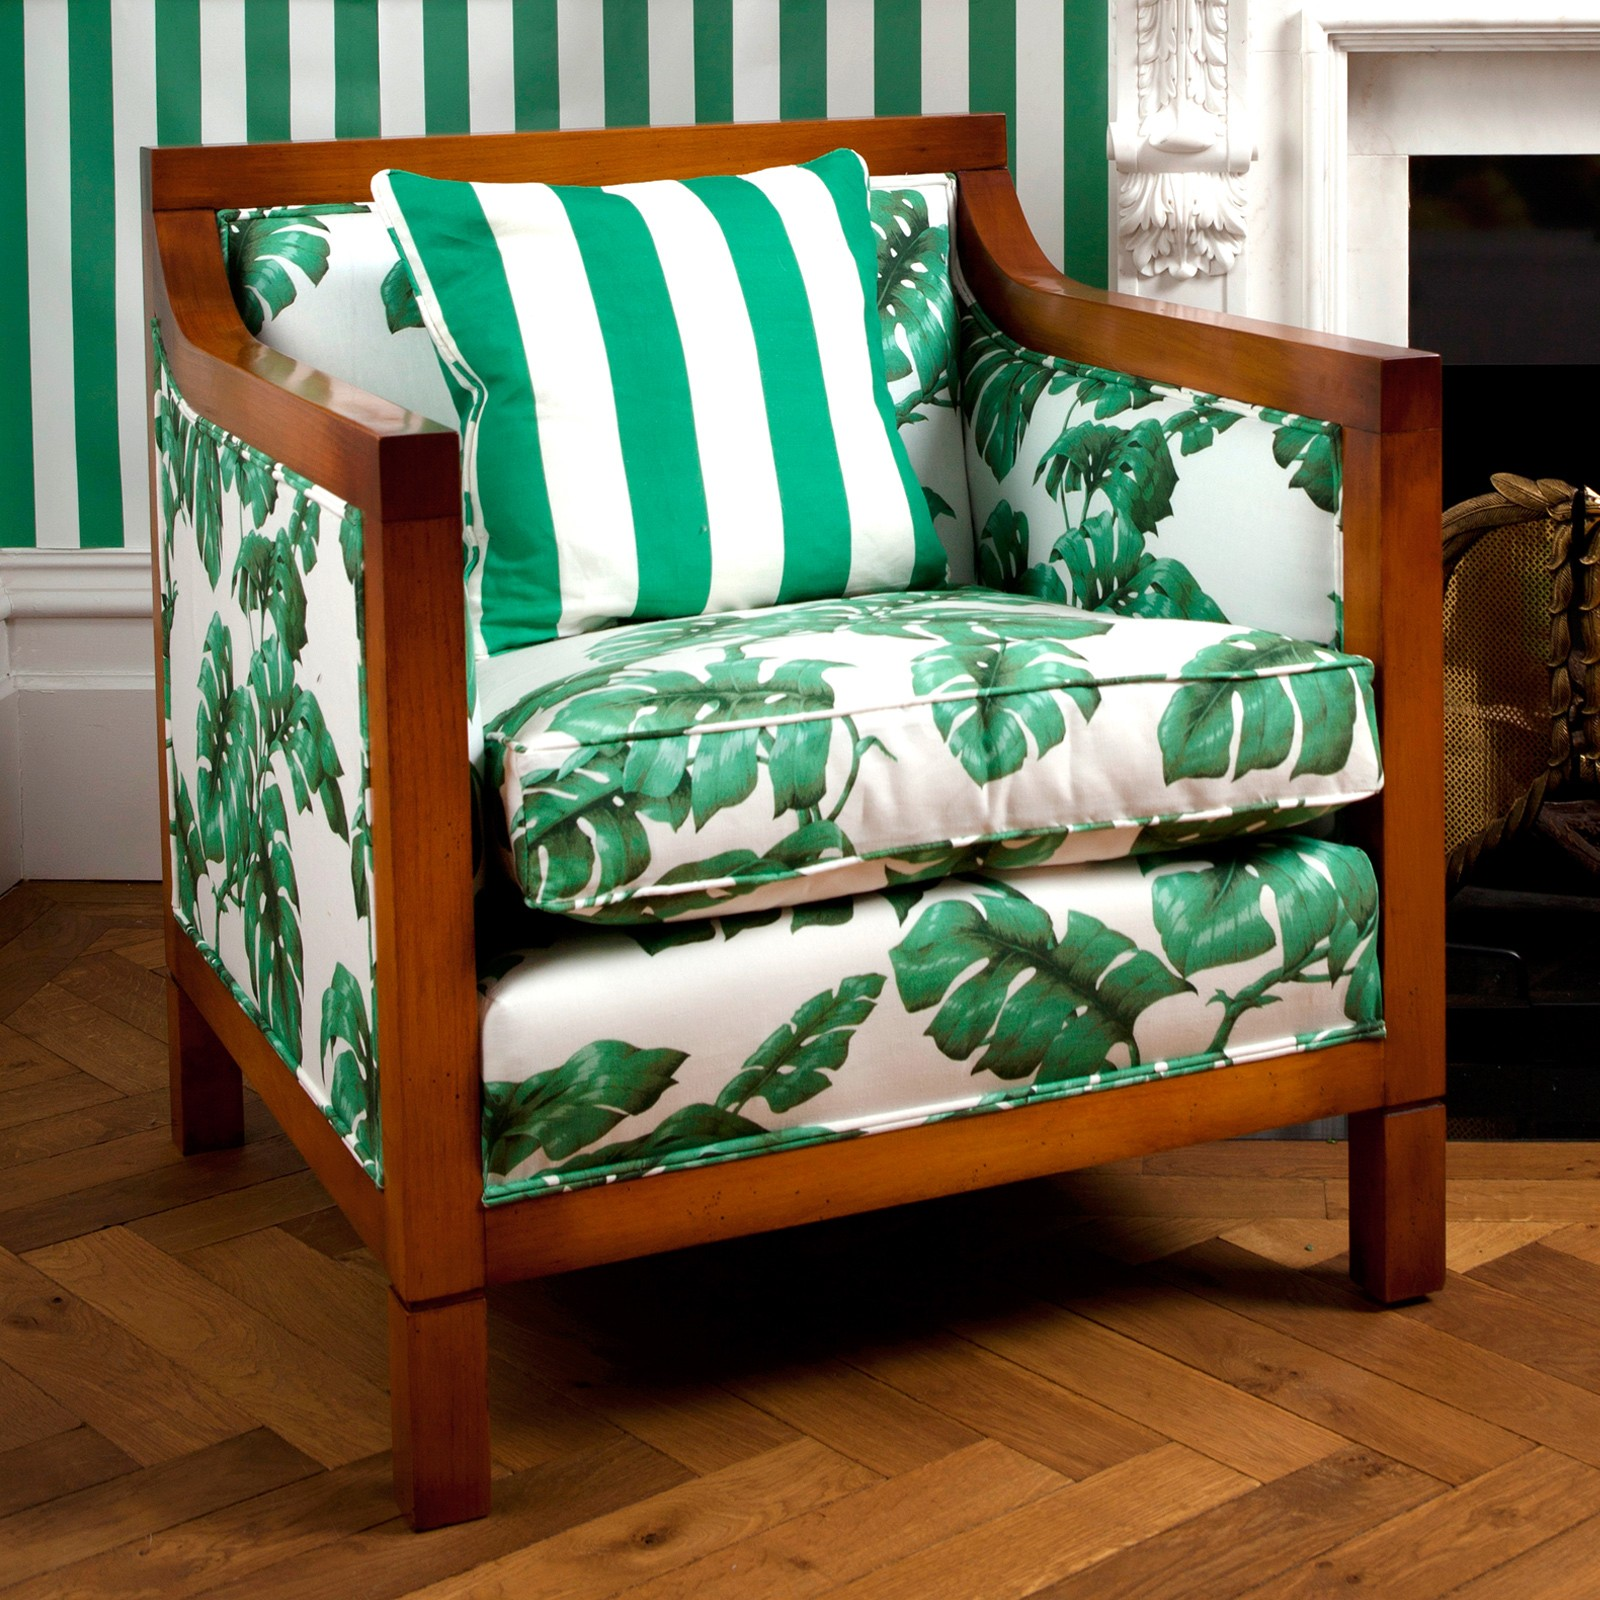 TAROVINE-Montague-Chair-White-Green-wallpaper-wp6005915